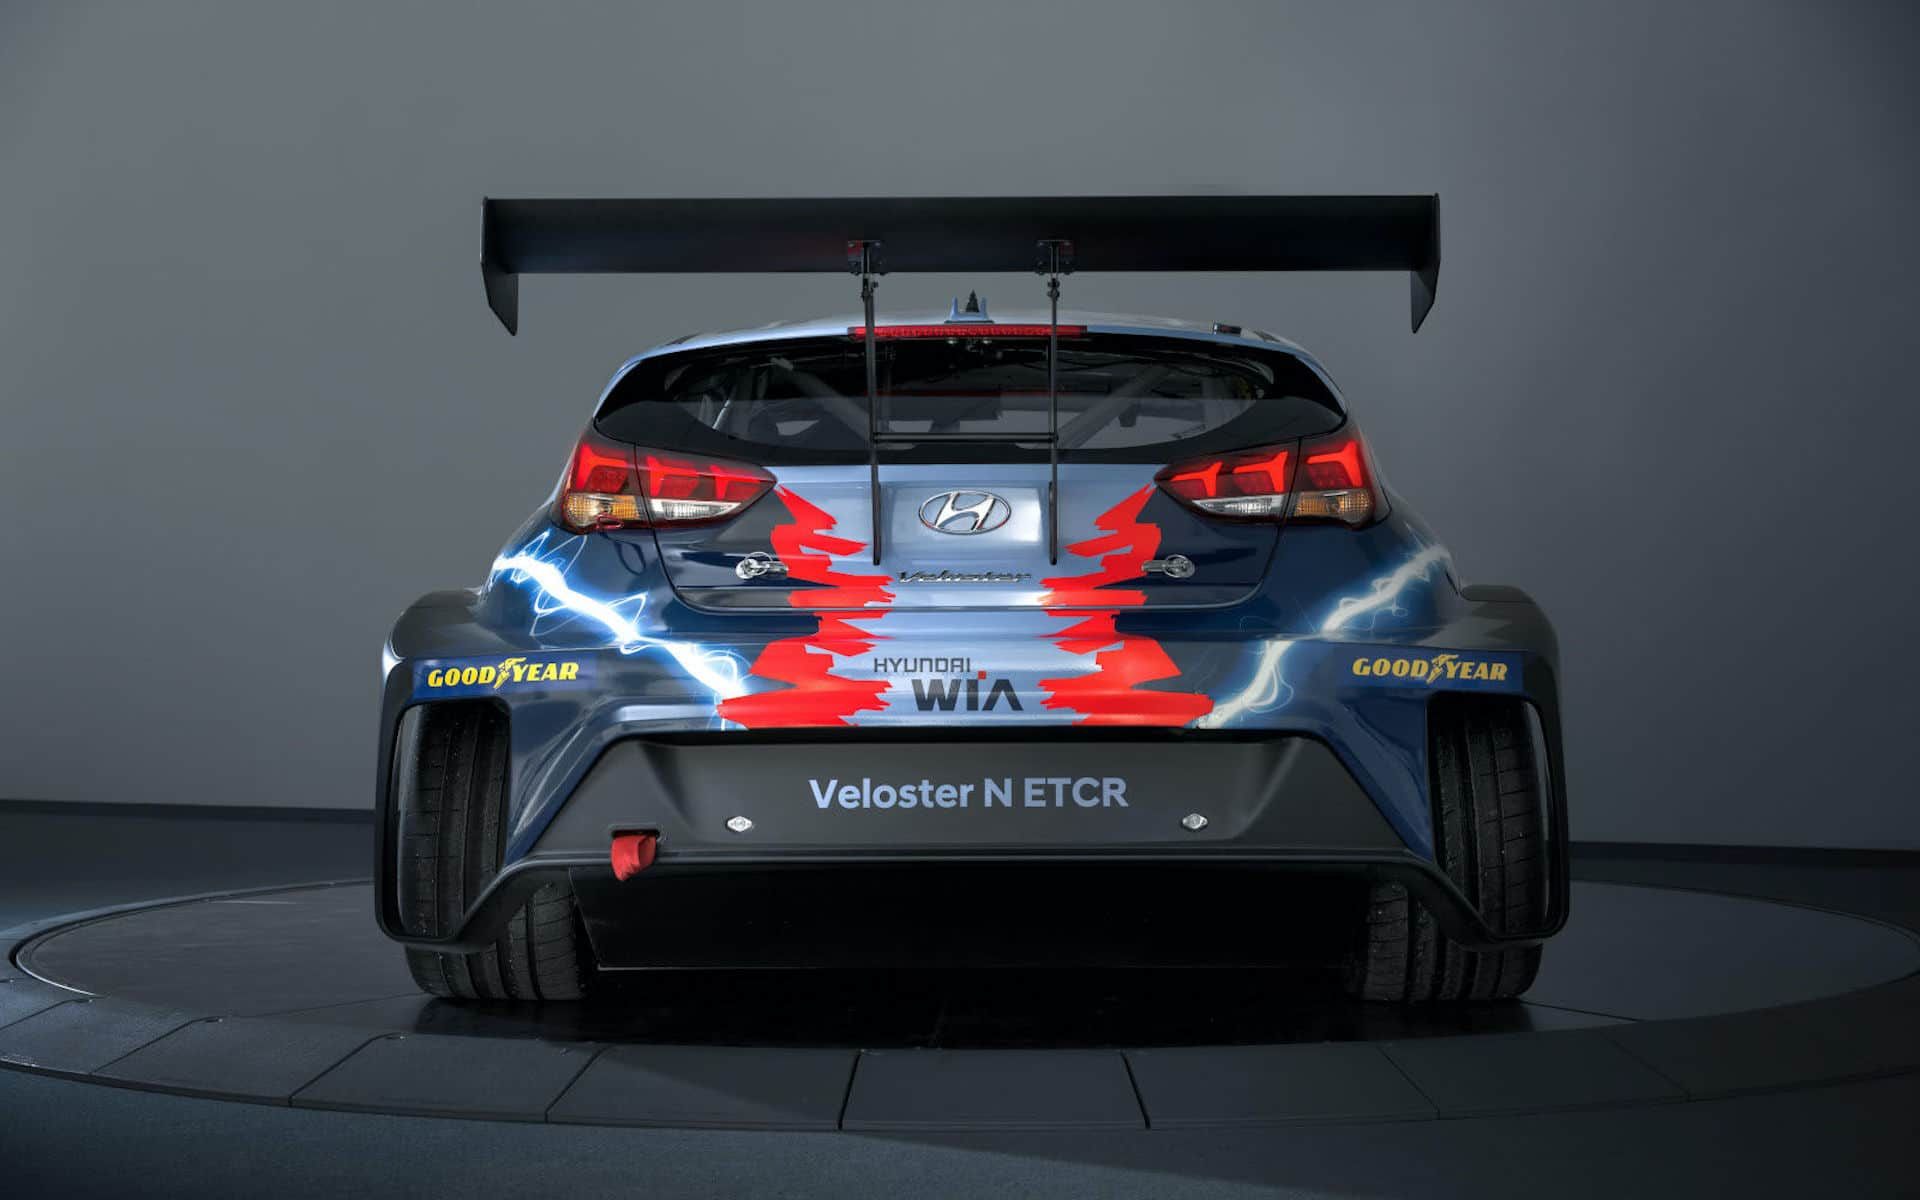 Hyundai-Motorsport-Elektroauto-Veloster-N-ETCR-Heck